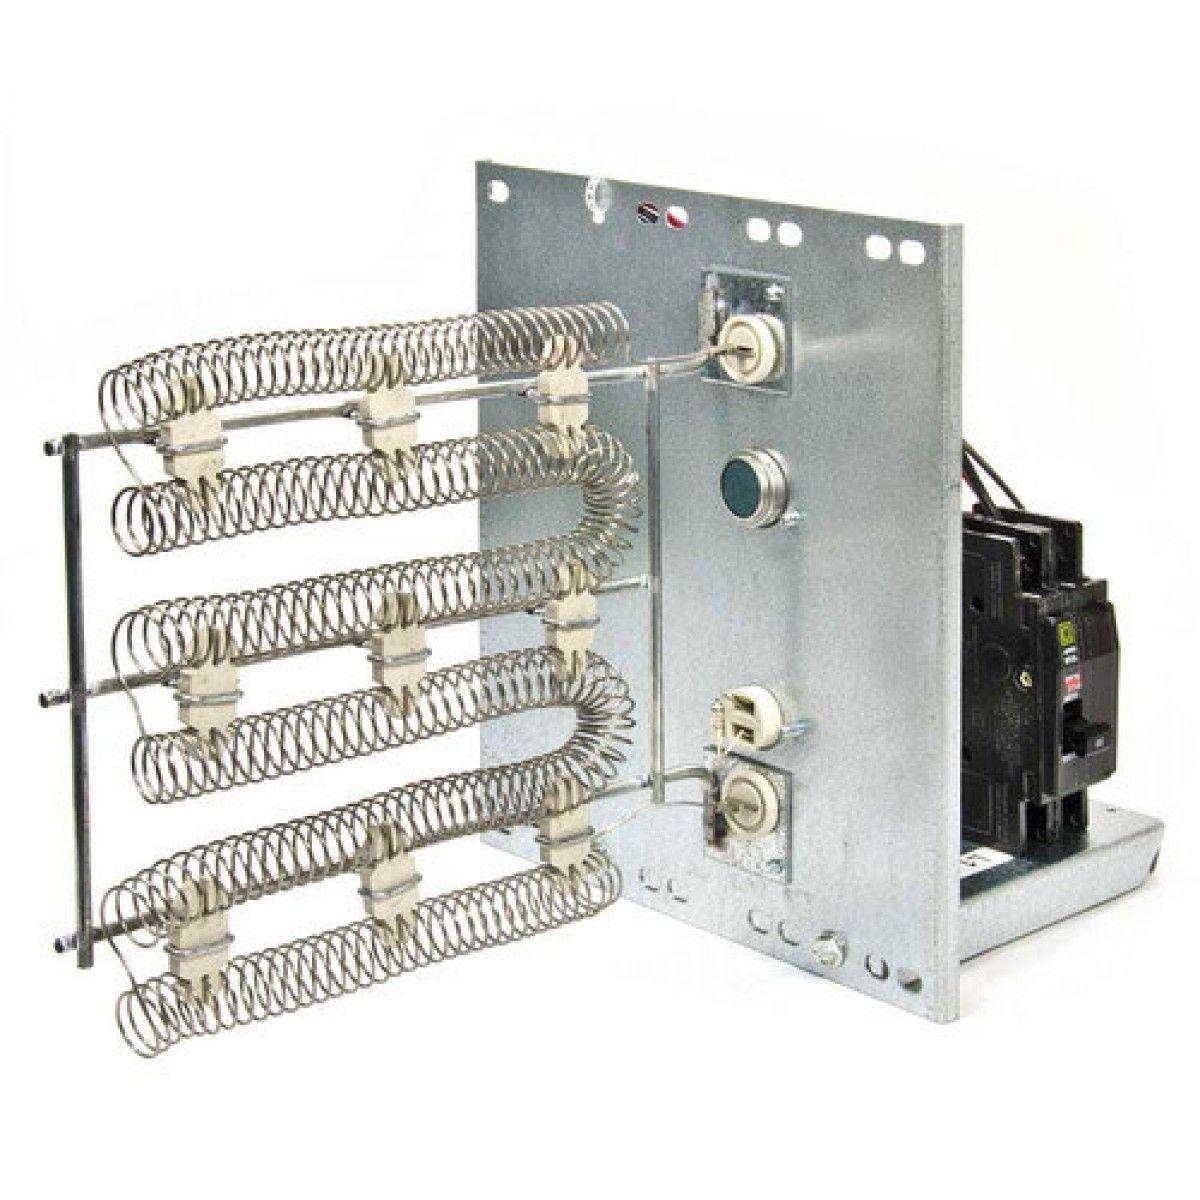 goodman wiring diagram 1966 mustang dash light 5 kw hksx05xc electric heat kits for air handlers heaters more views